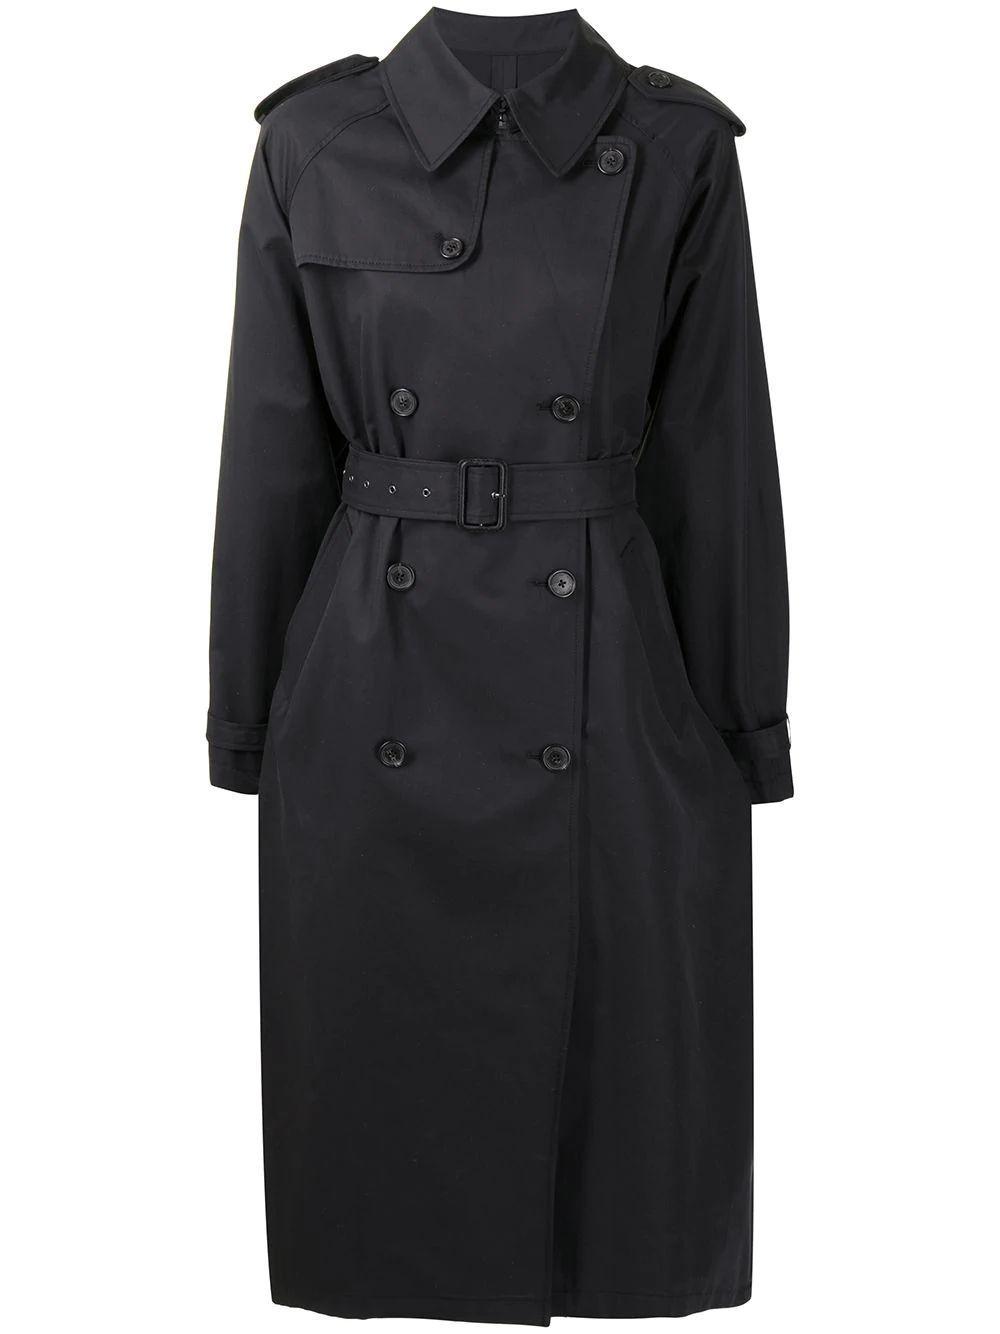 Tanner Trench Coat Item # 10979-W790